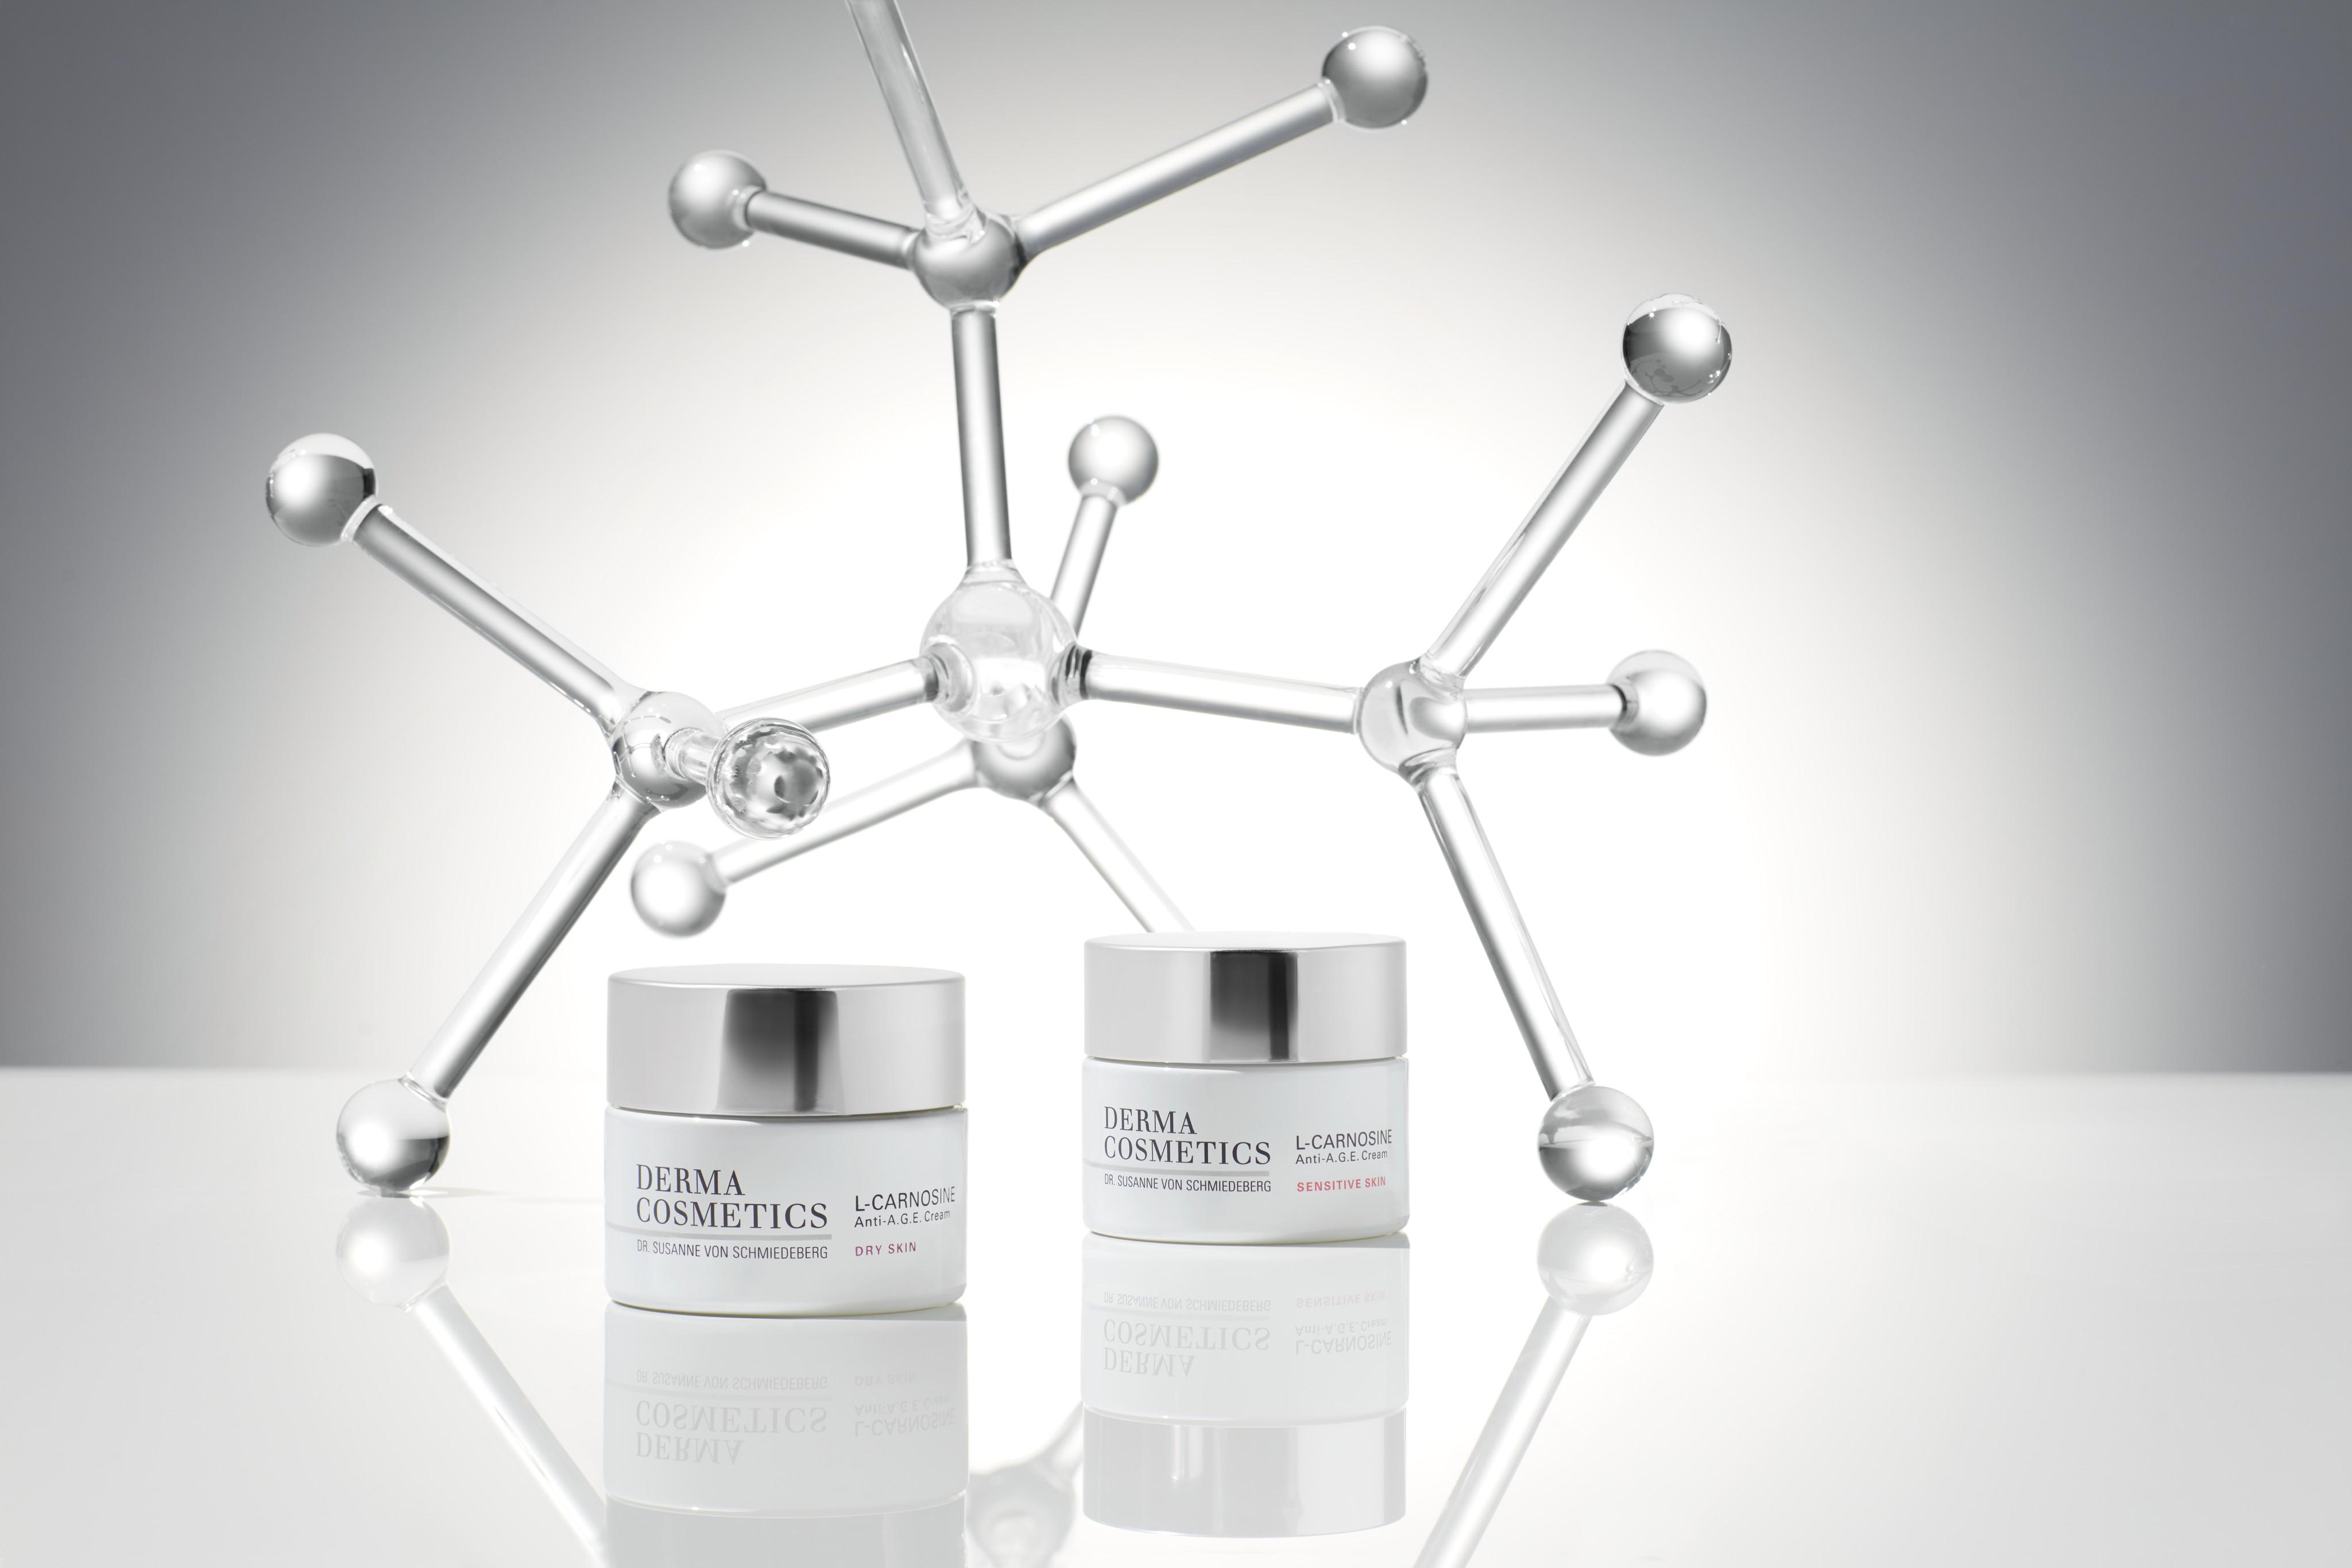 Skincare_DC_Product_Molekule_L-Carnosine-dry-cream-Web-Rendition